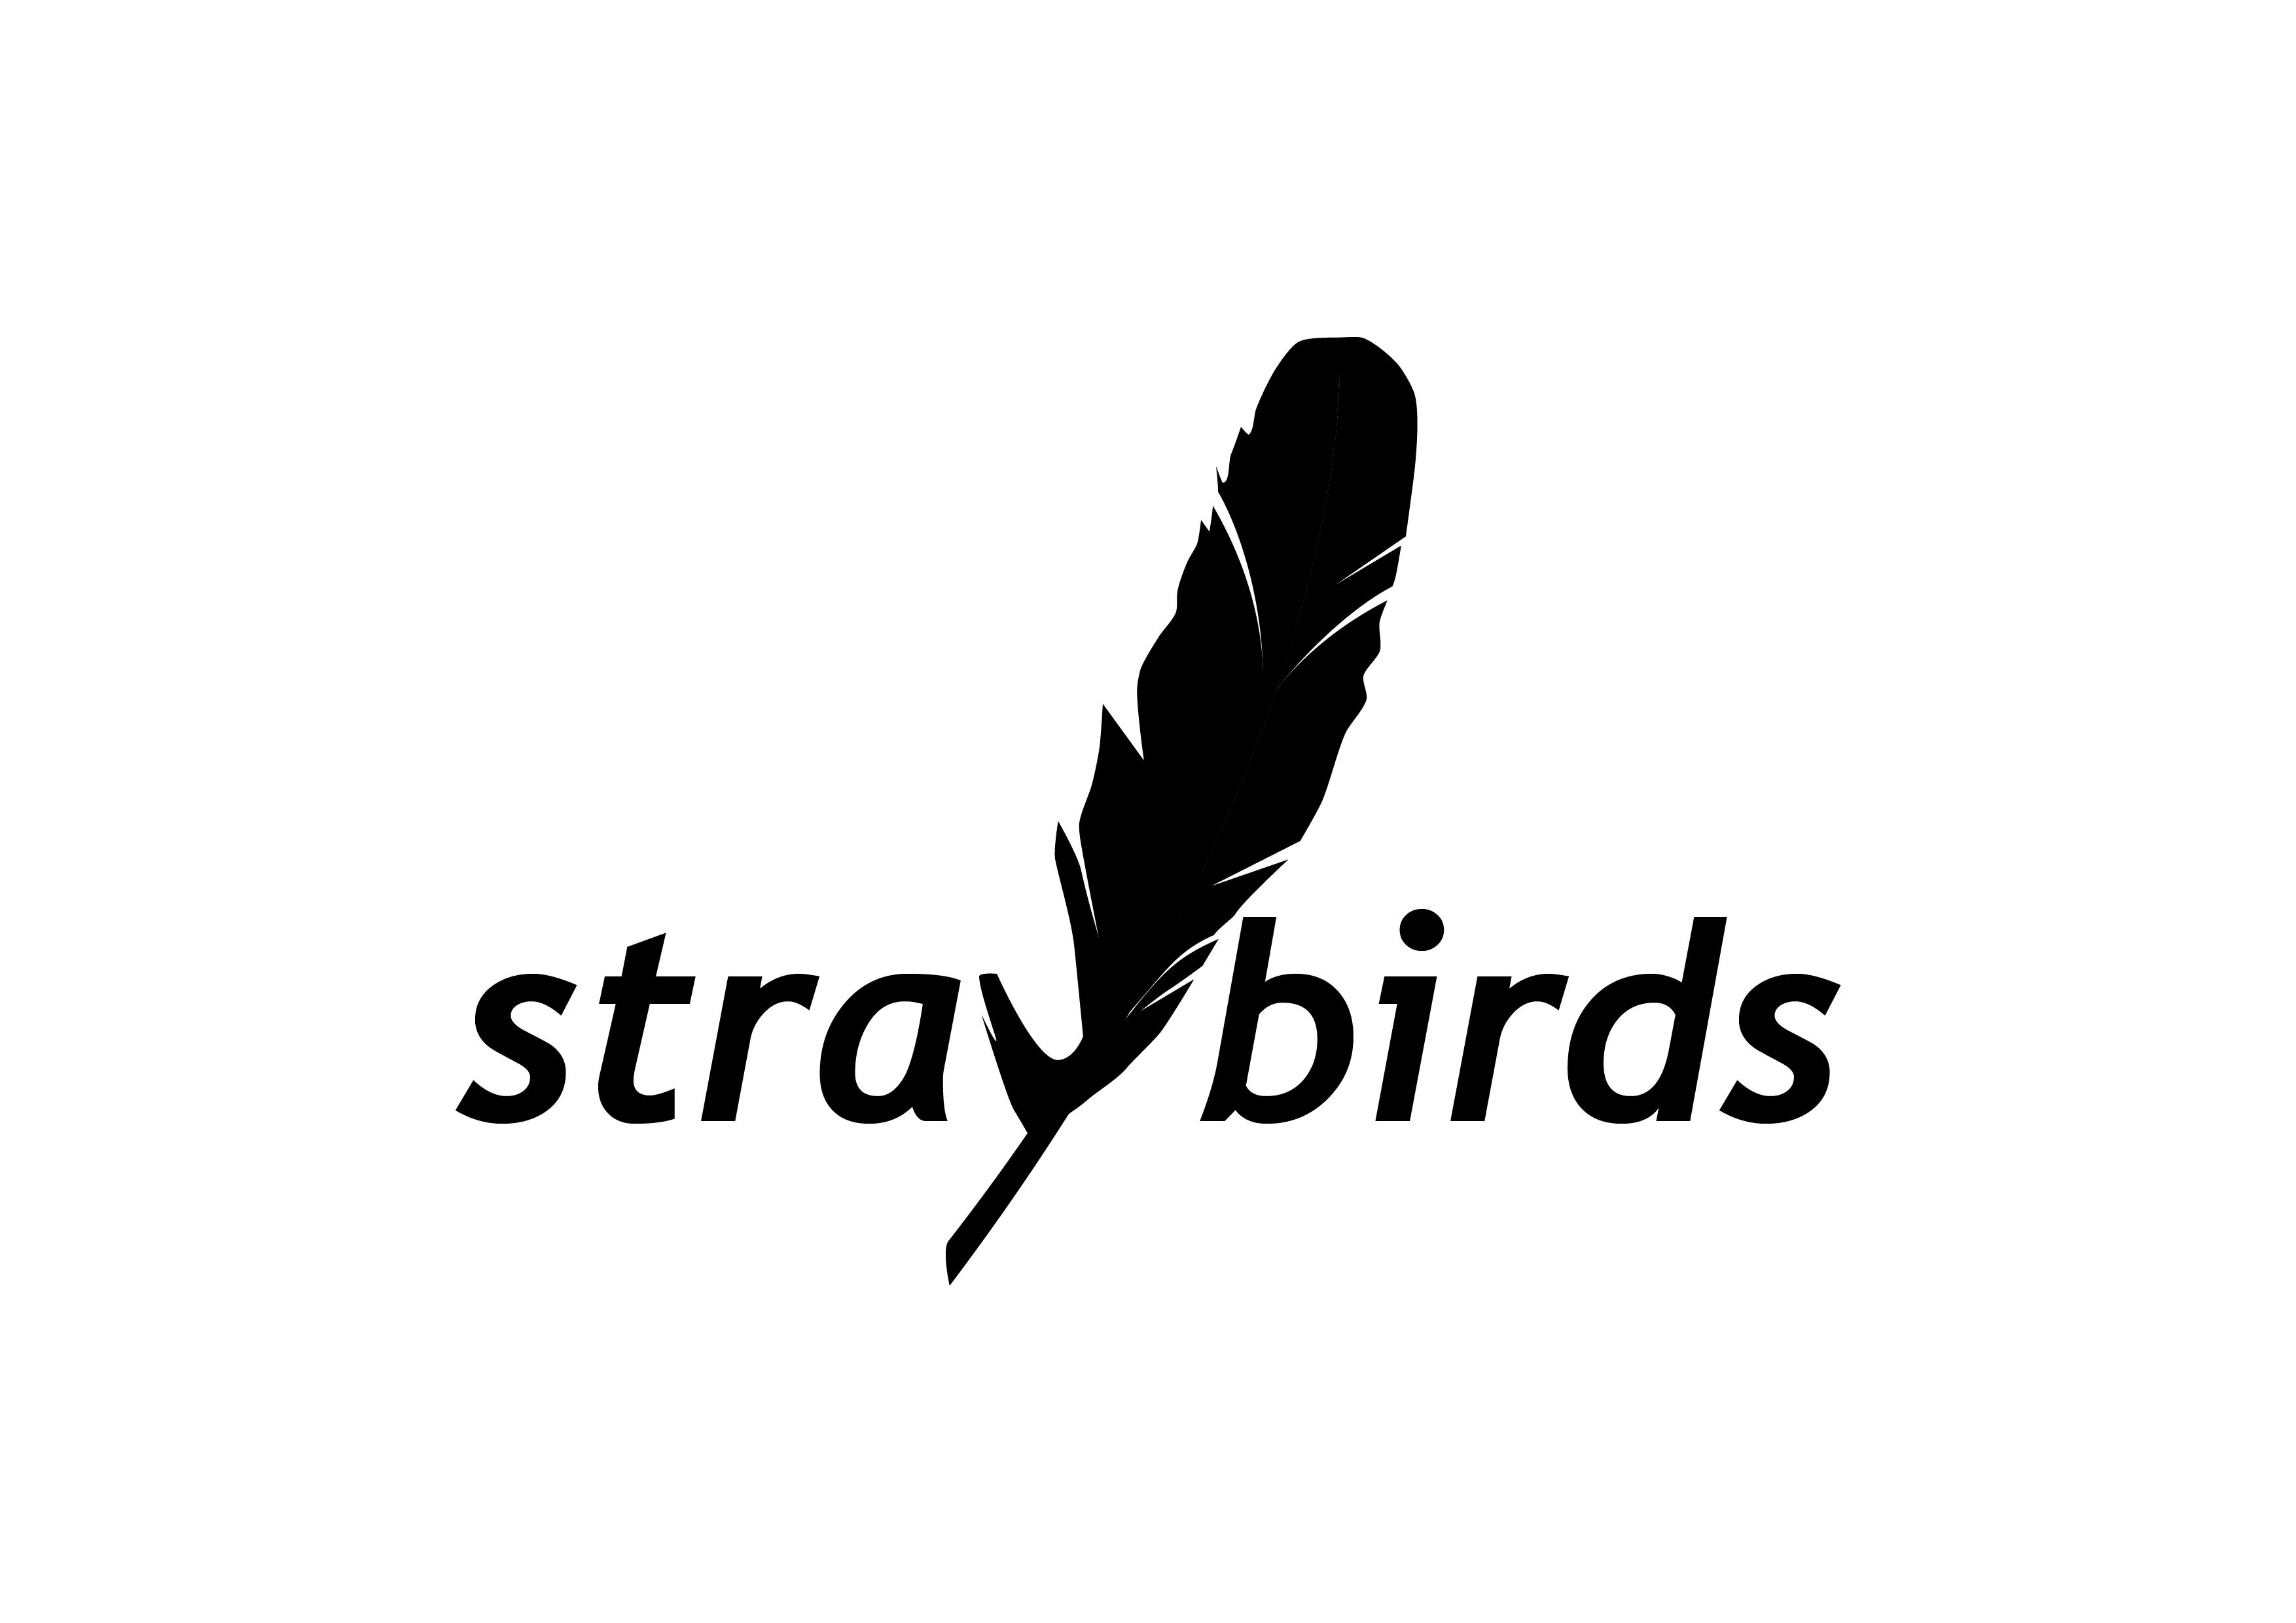 Straybirds logo